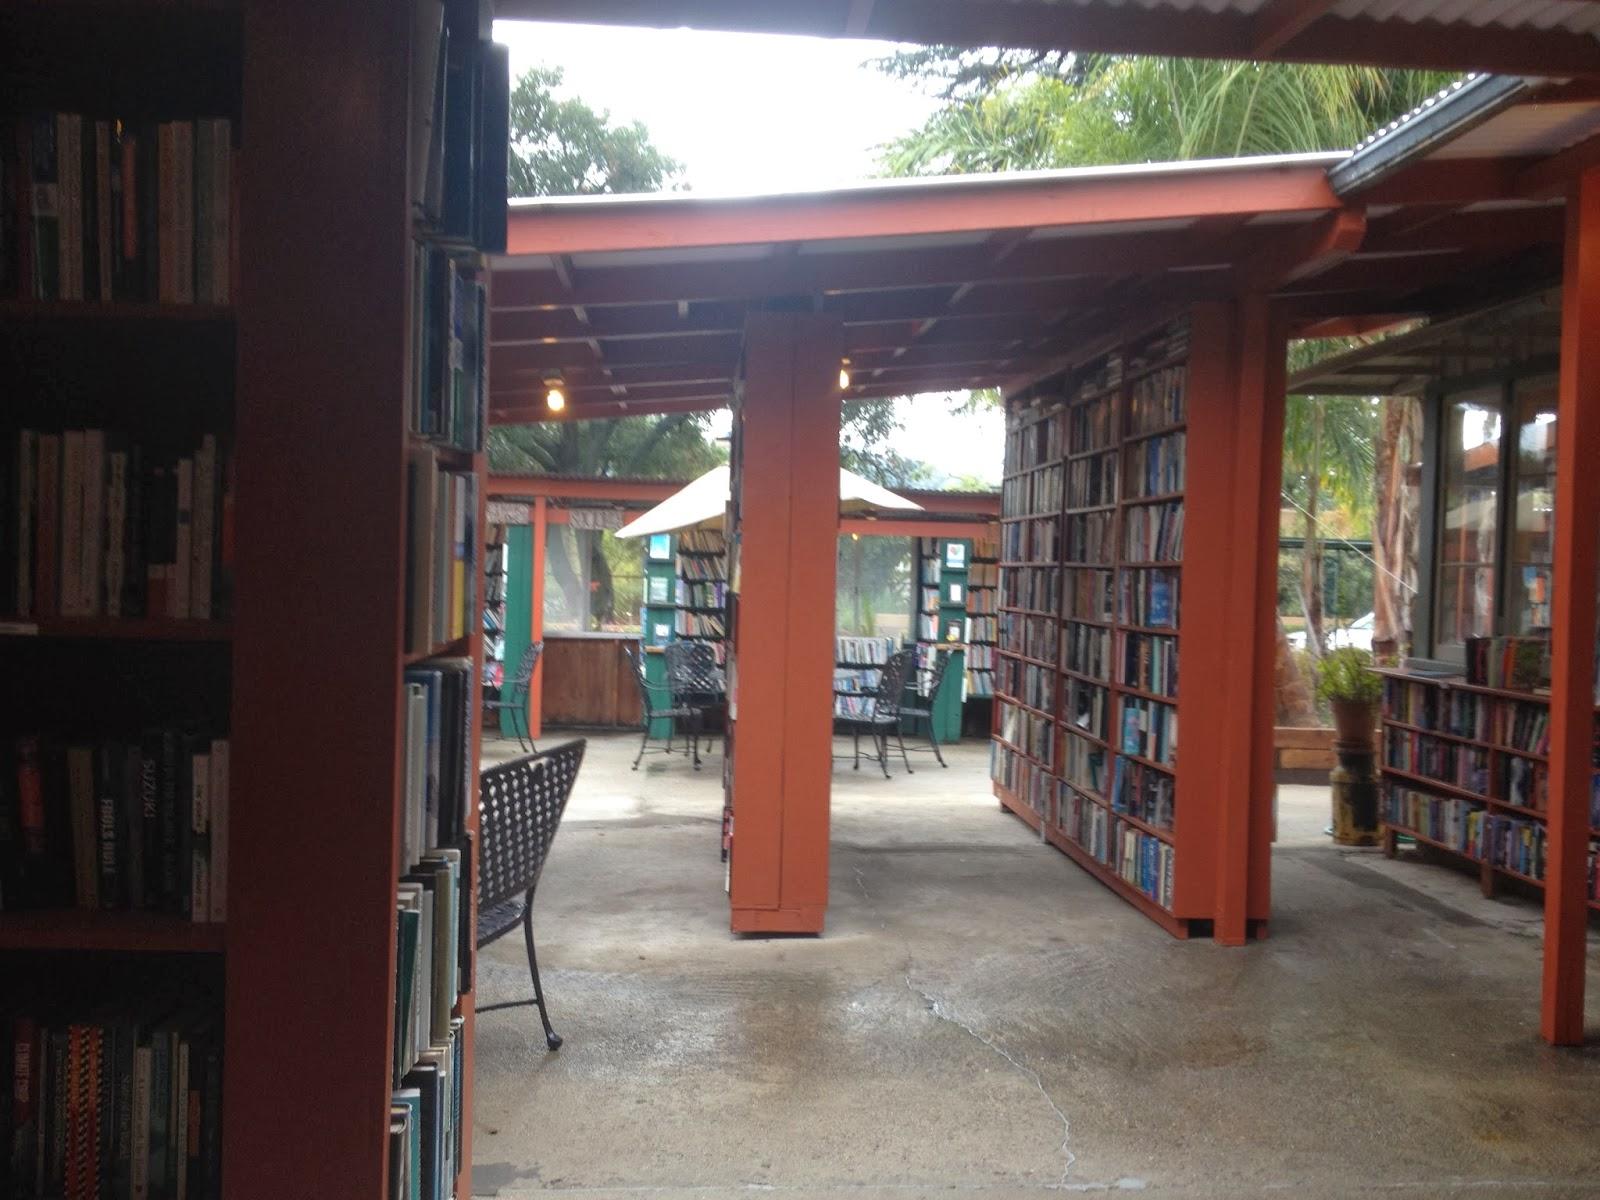 Bart's books, ojai, travel